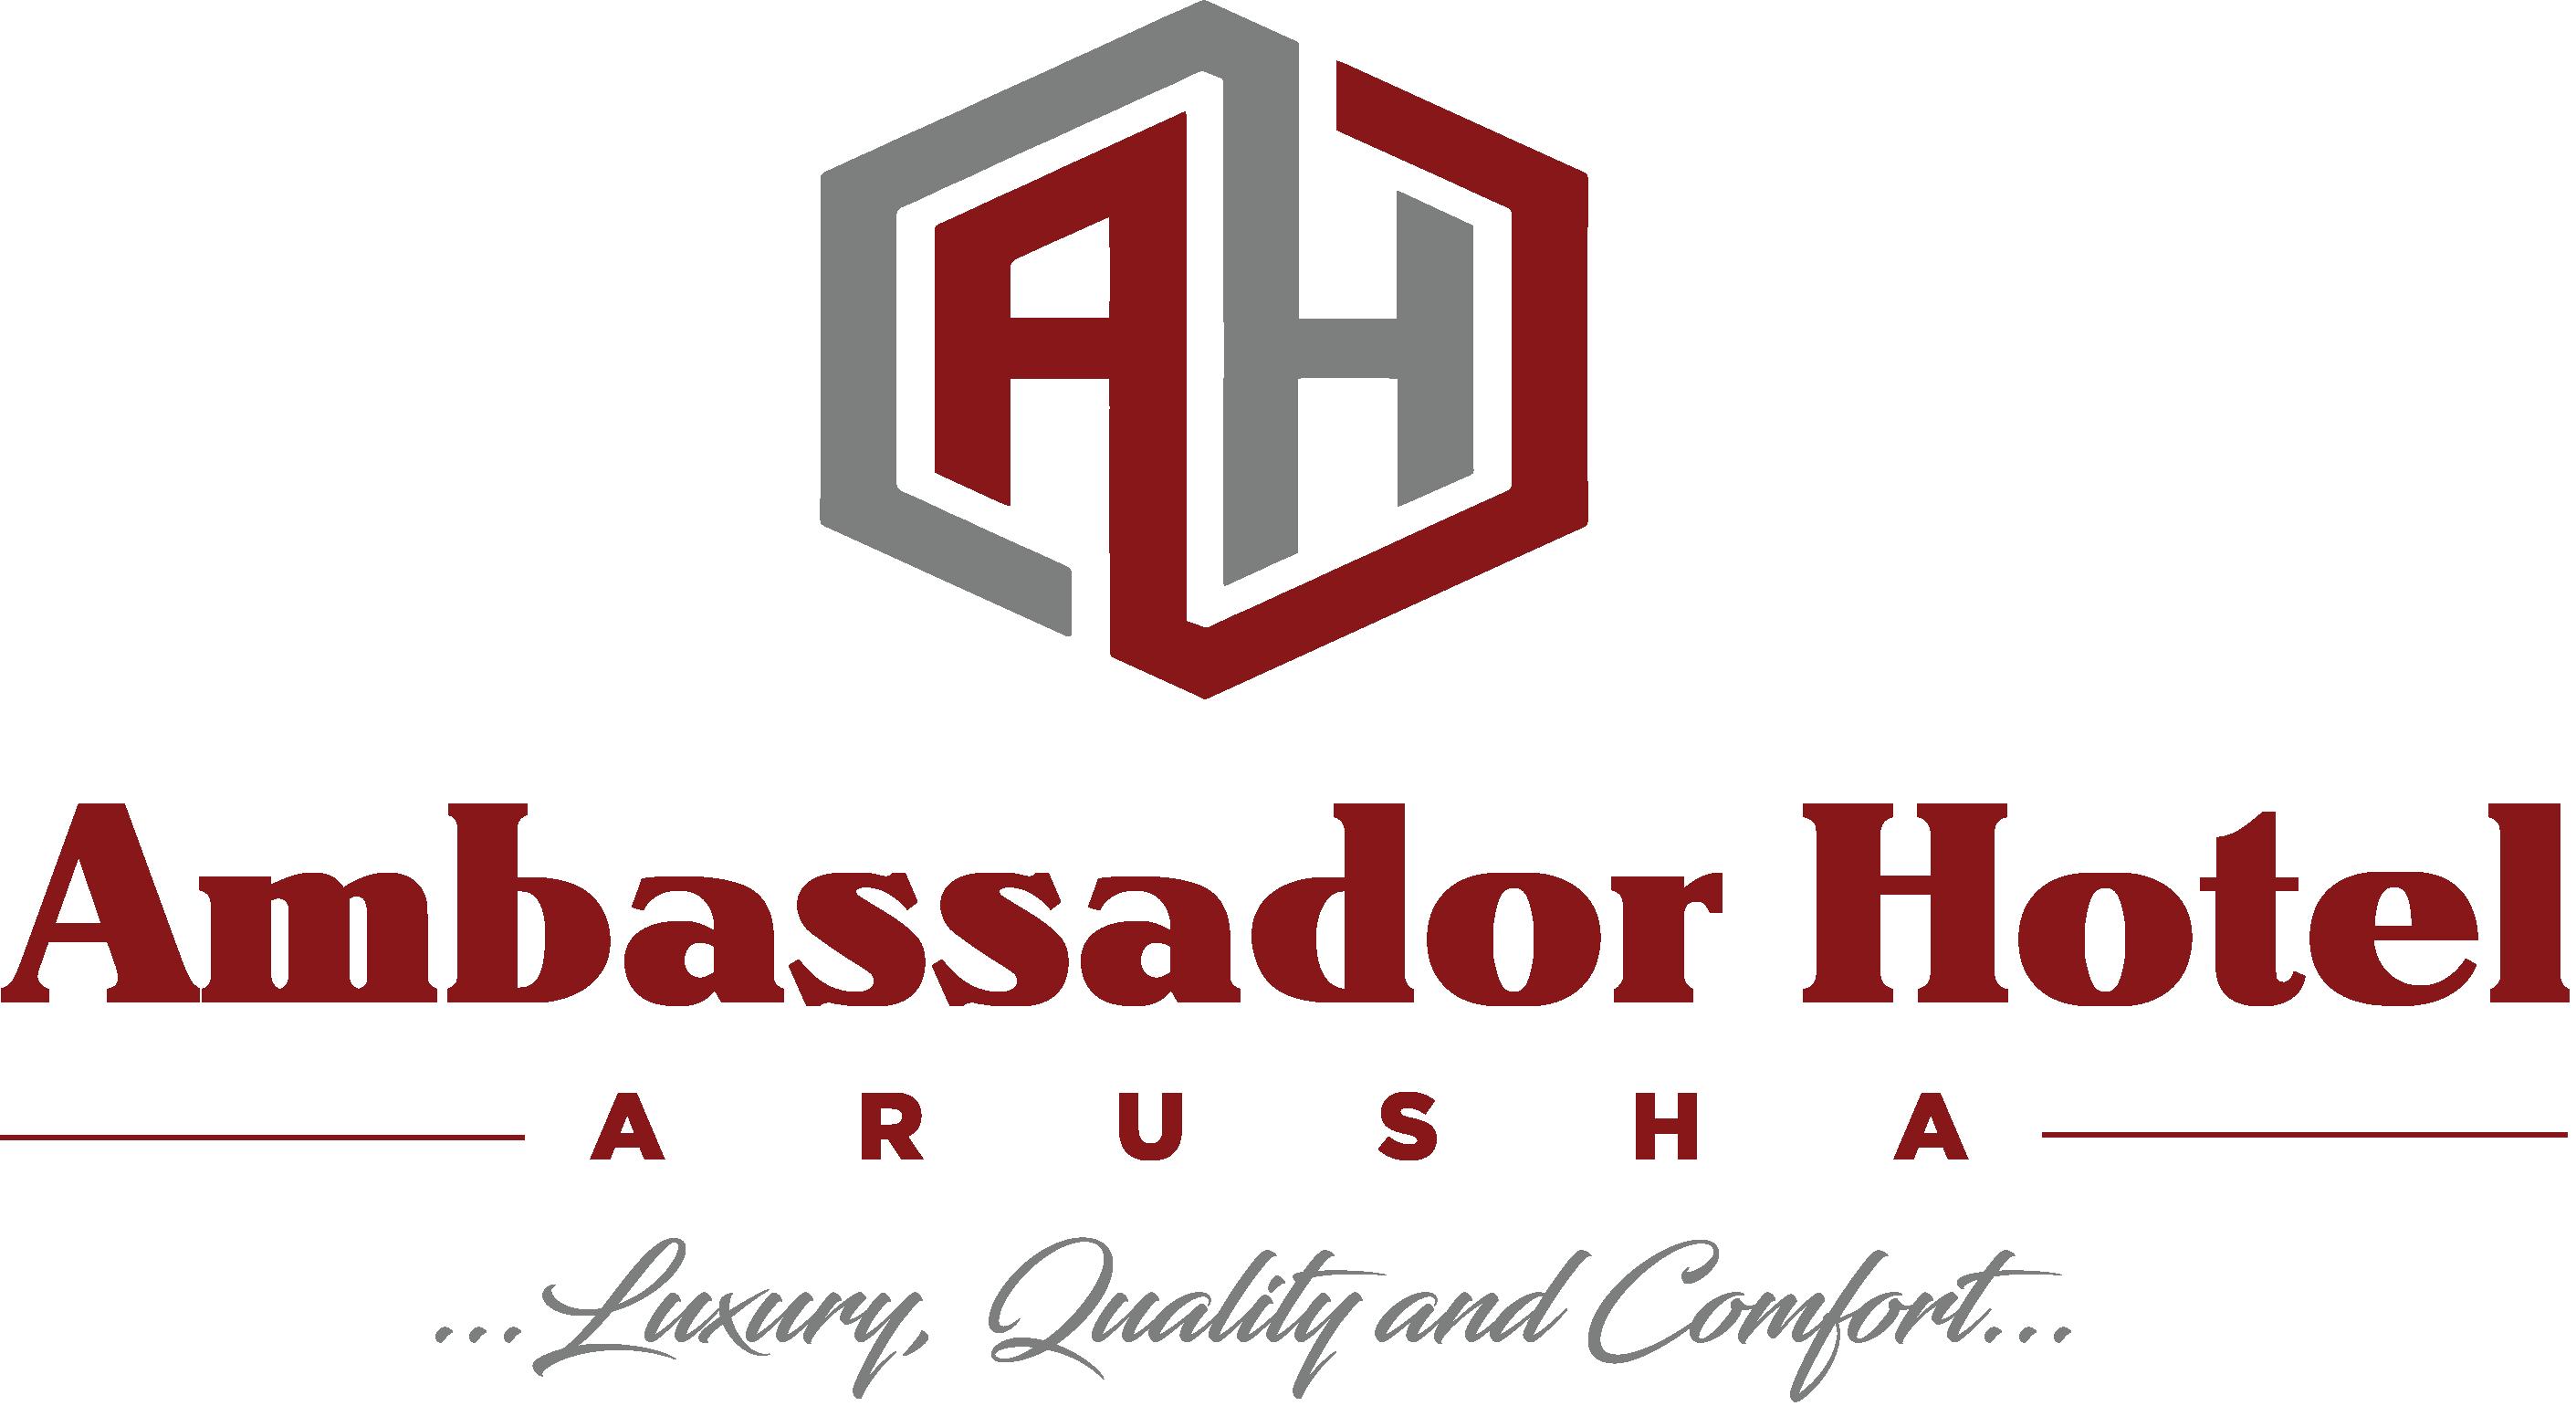 Ambassador Hotel Arusha